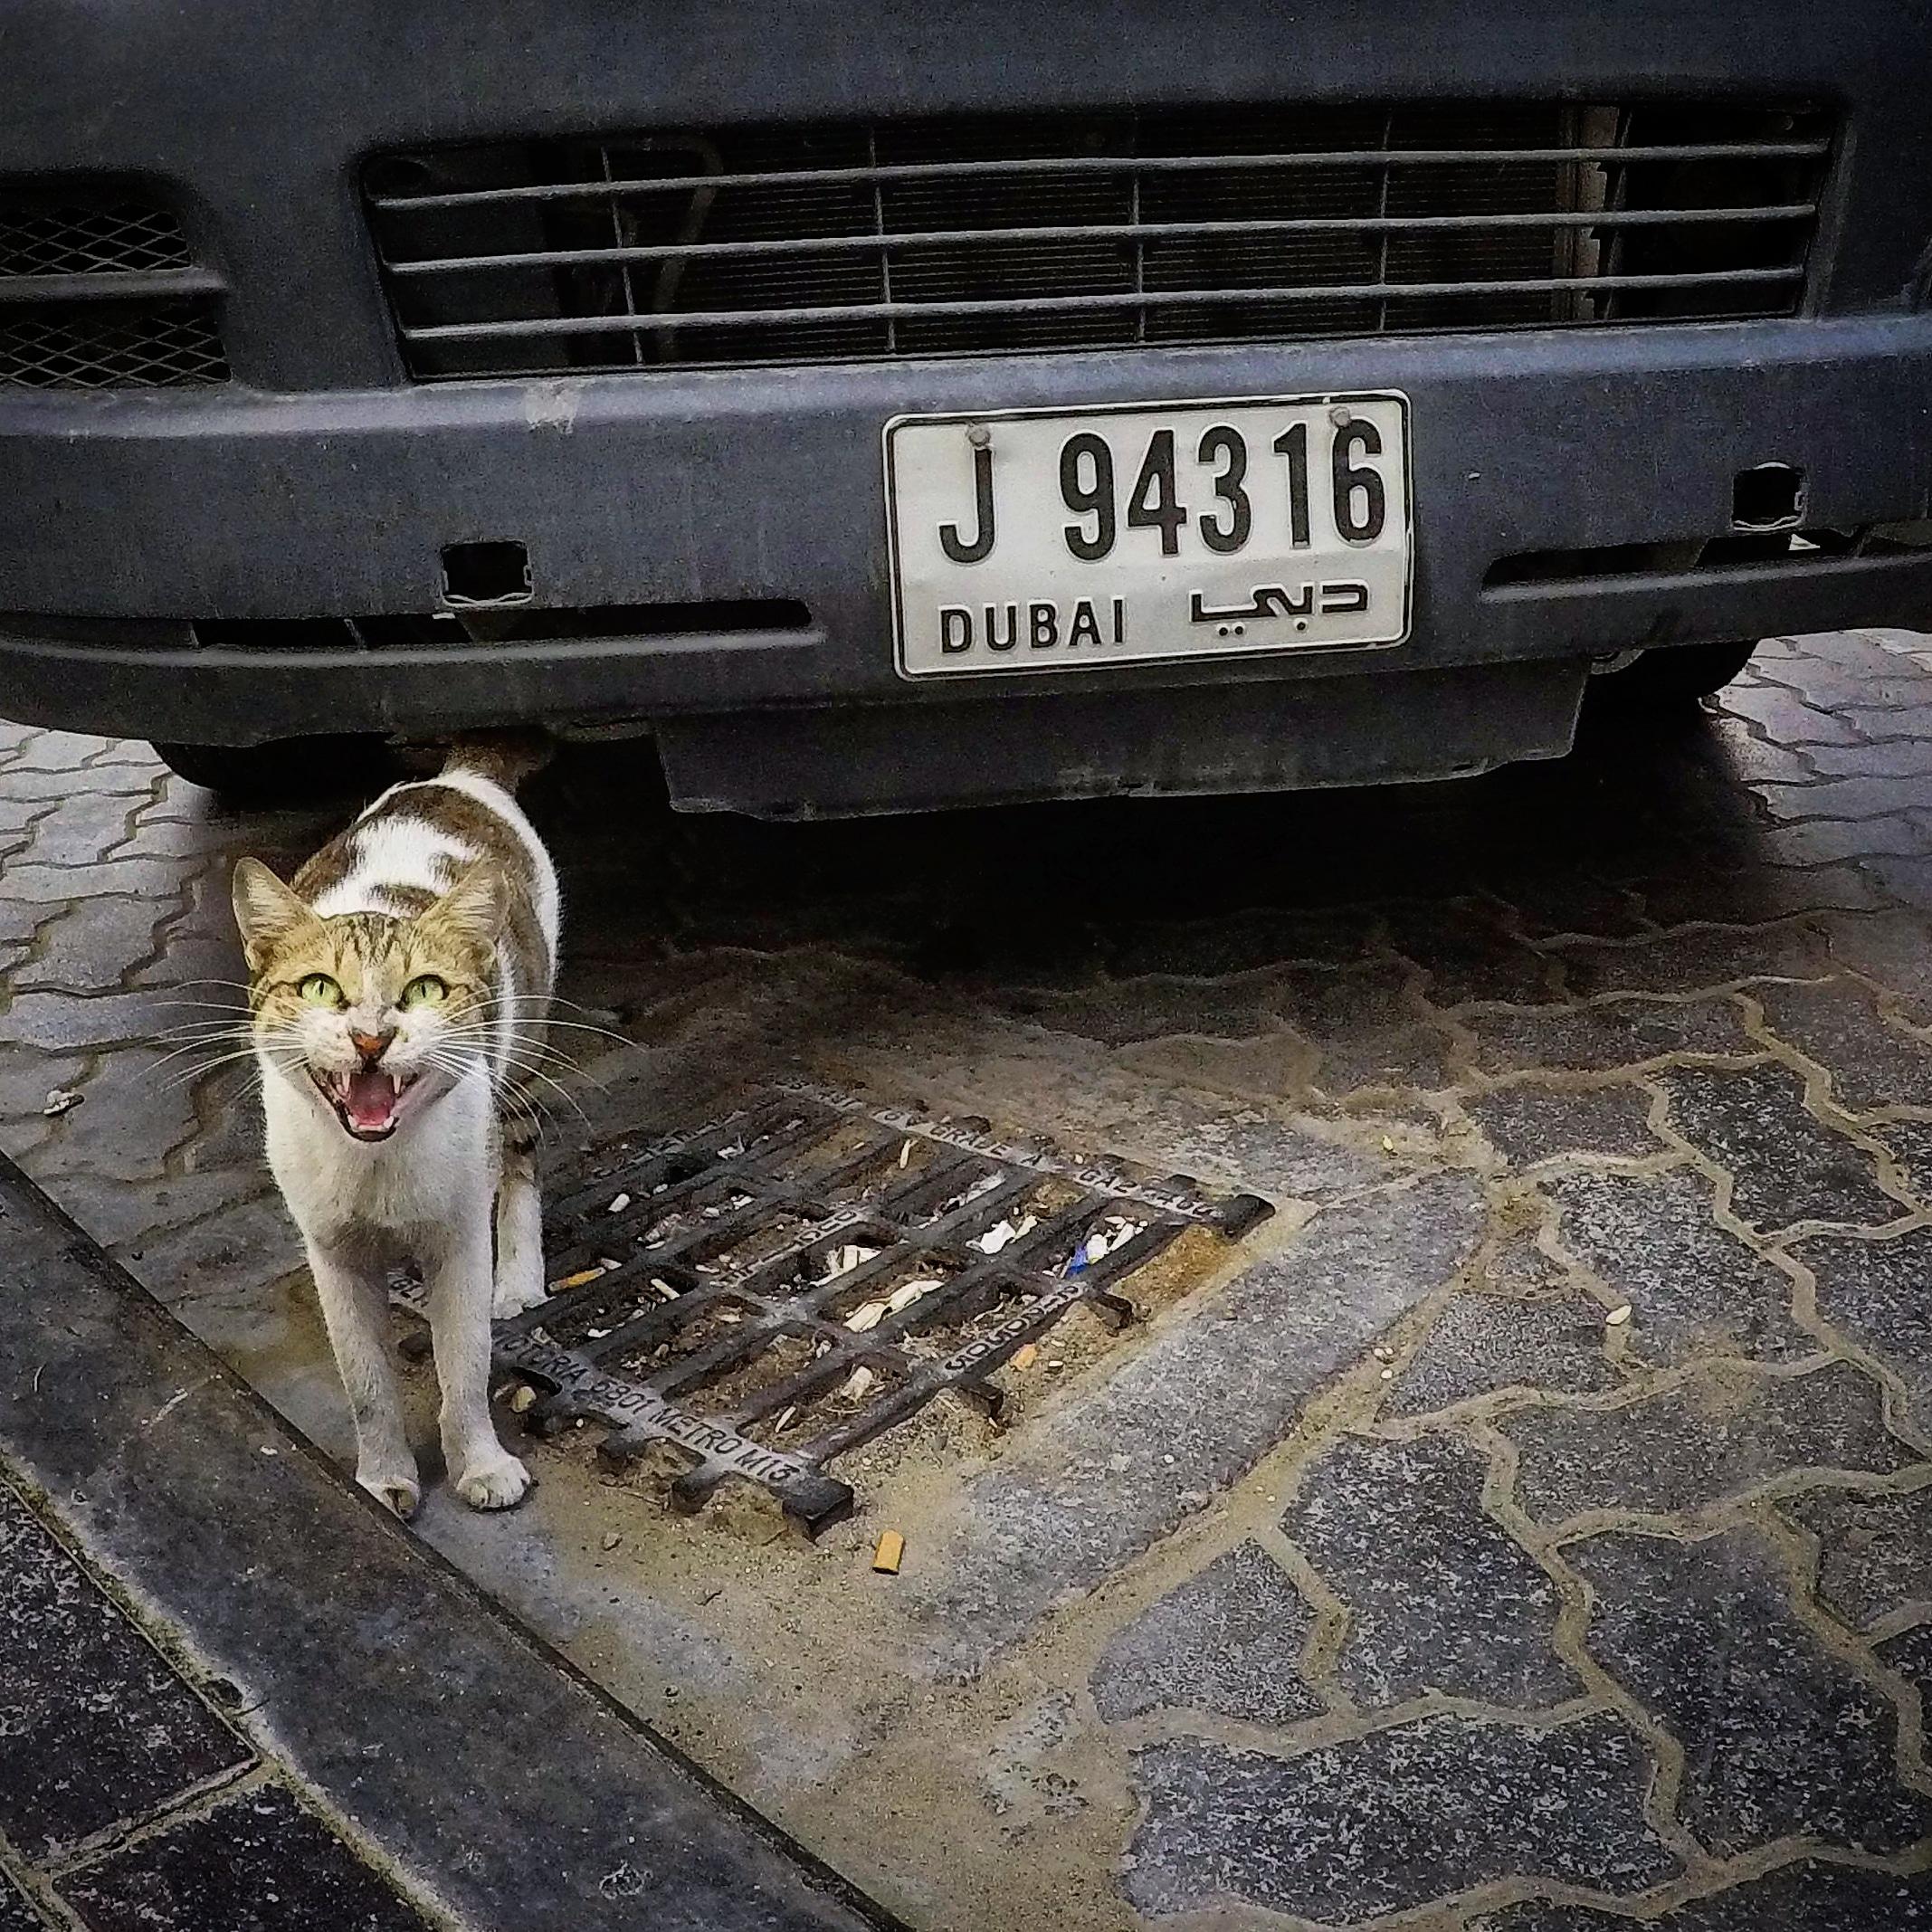 Stray cat, Sharjah, United Arab Emirates